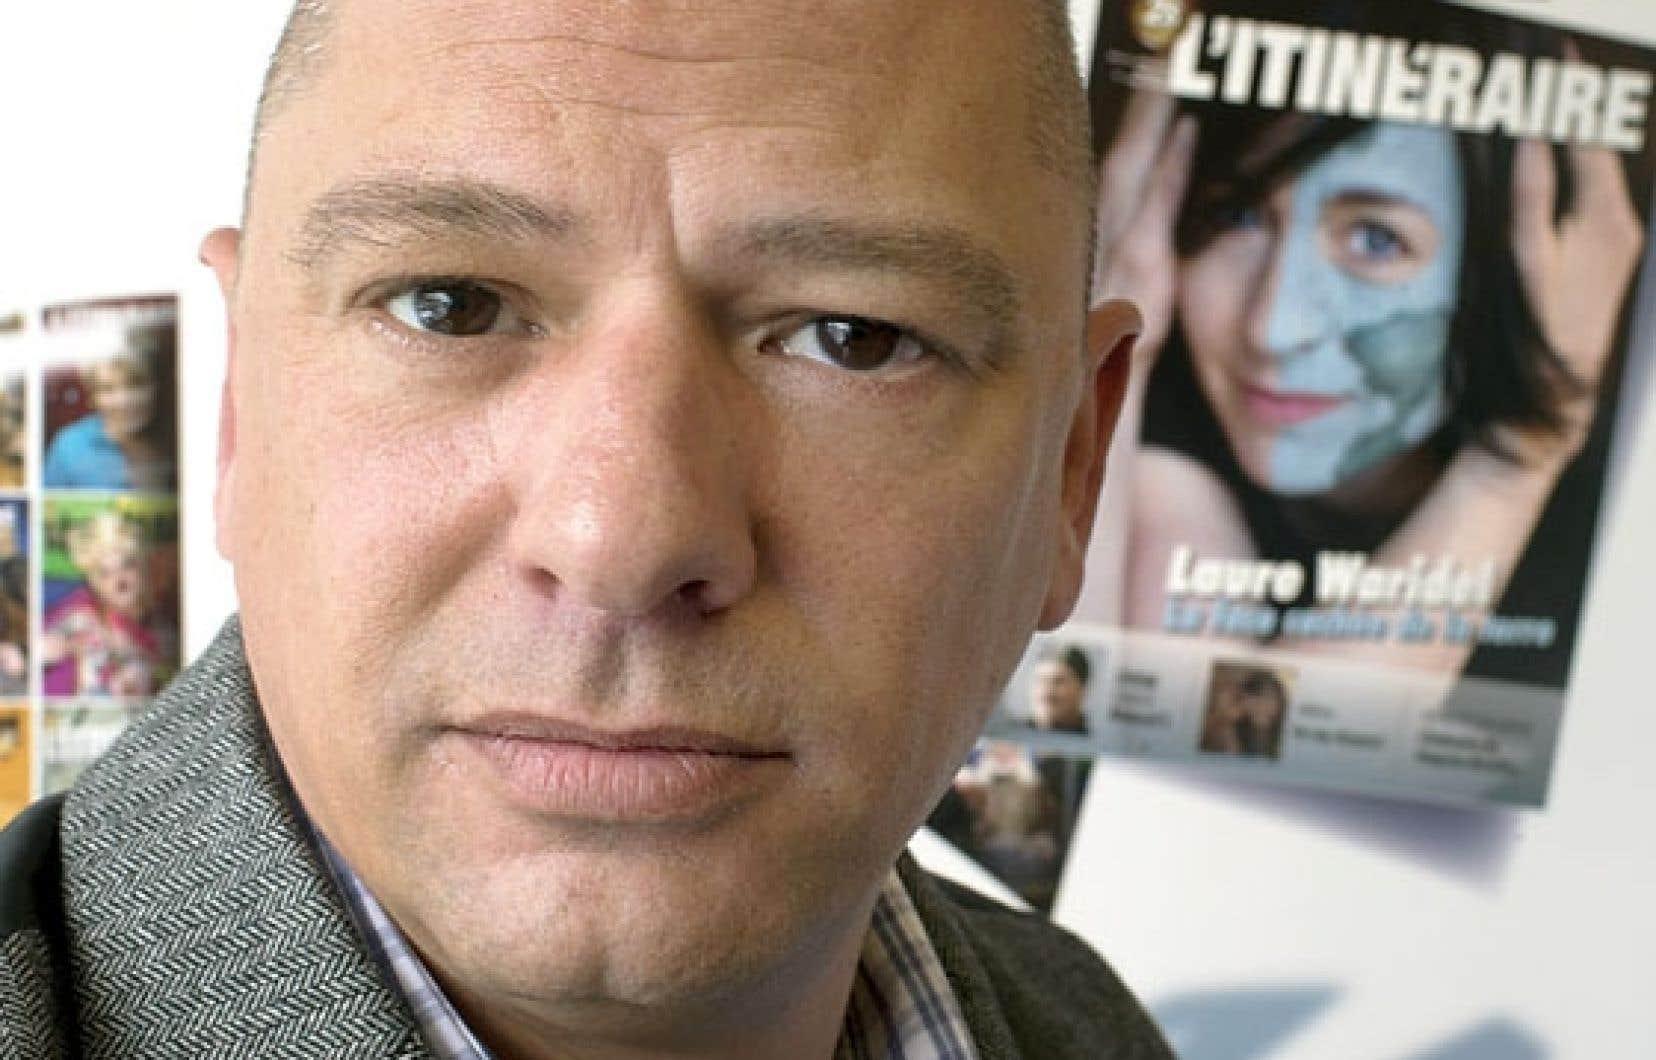 Serge Lareault